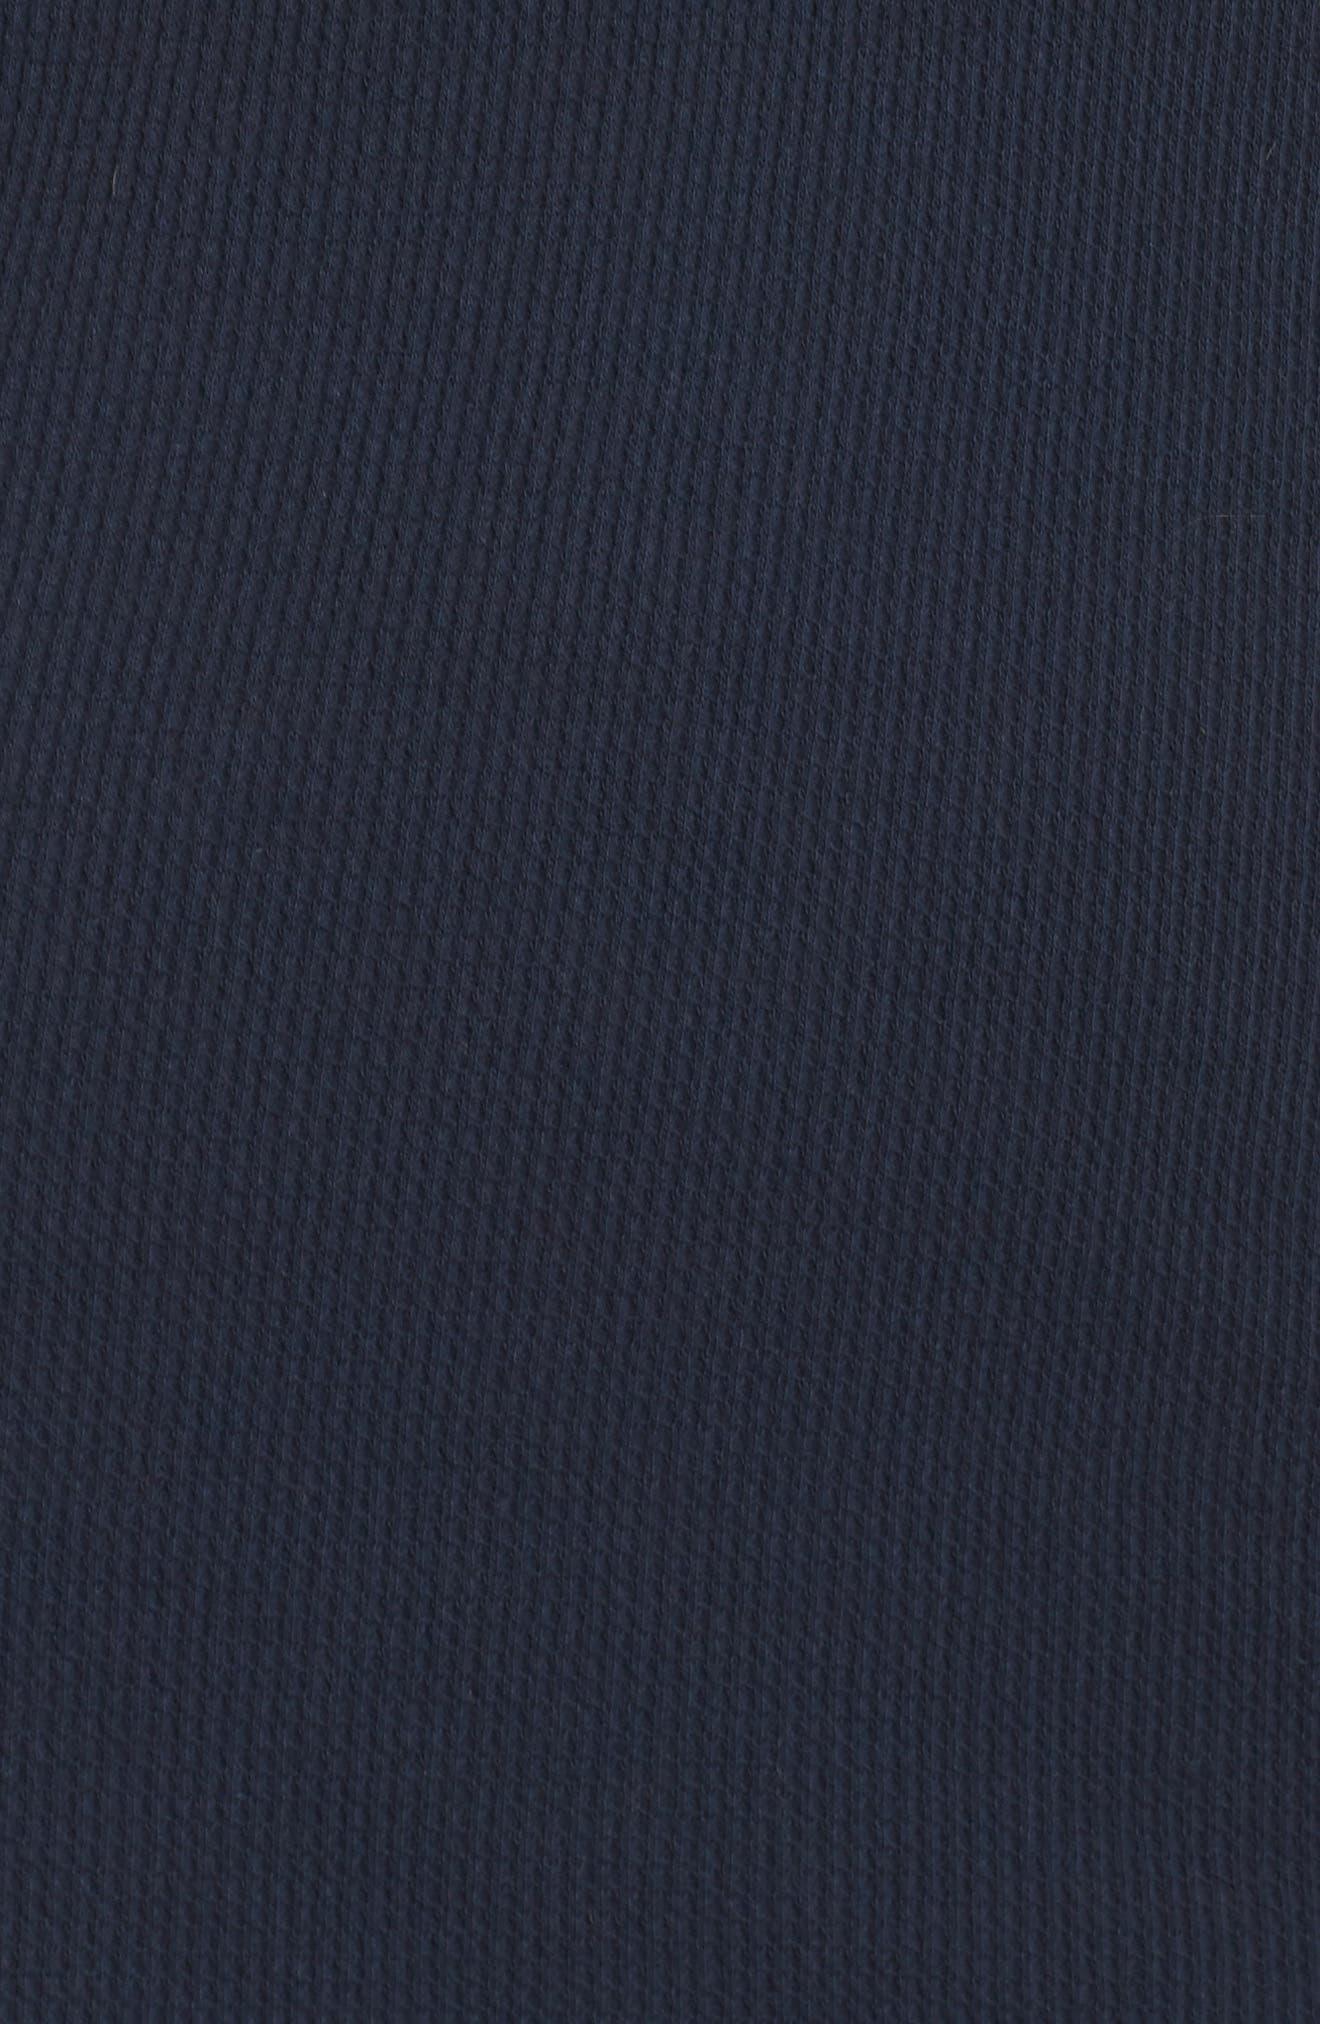 Wynn Henley Sleep Shirt,                             Alternate thumbnail 6, color,                             Bright Navy